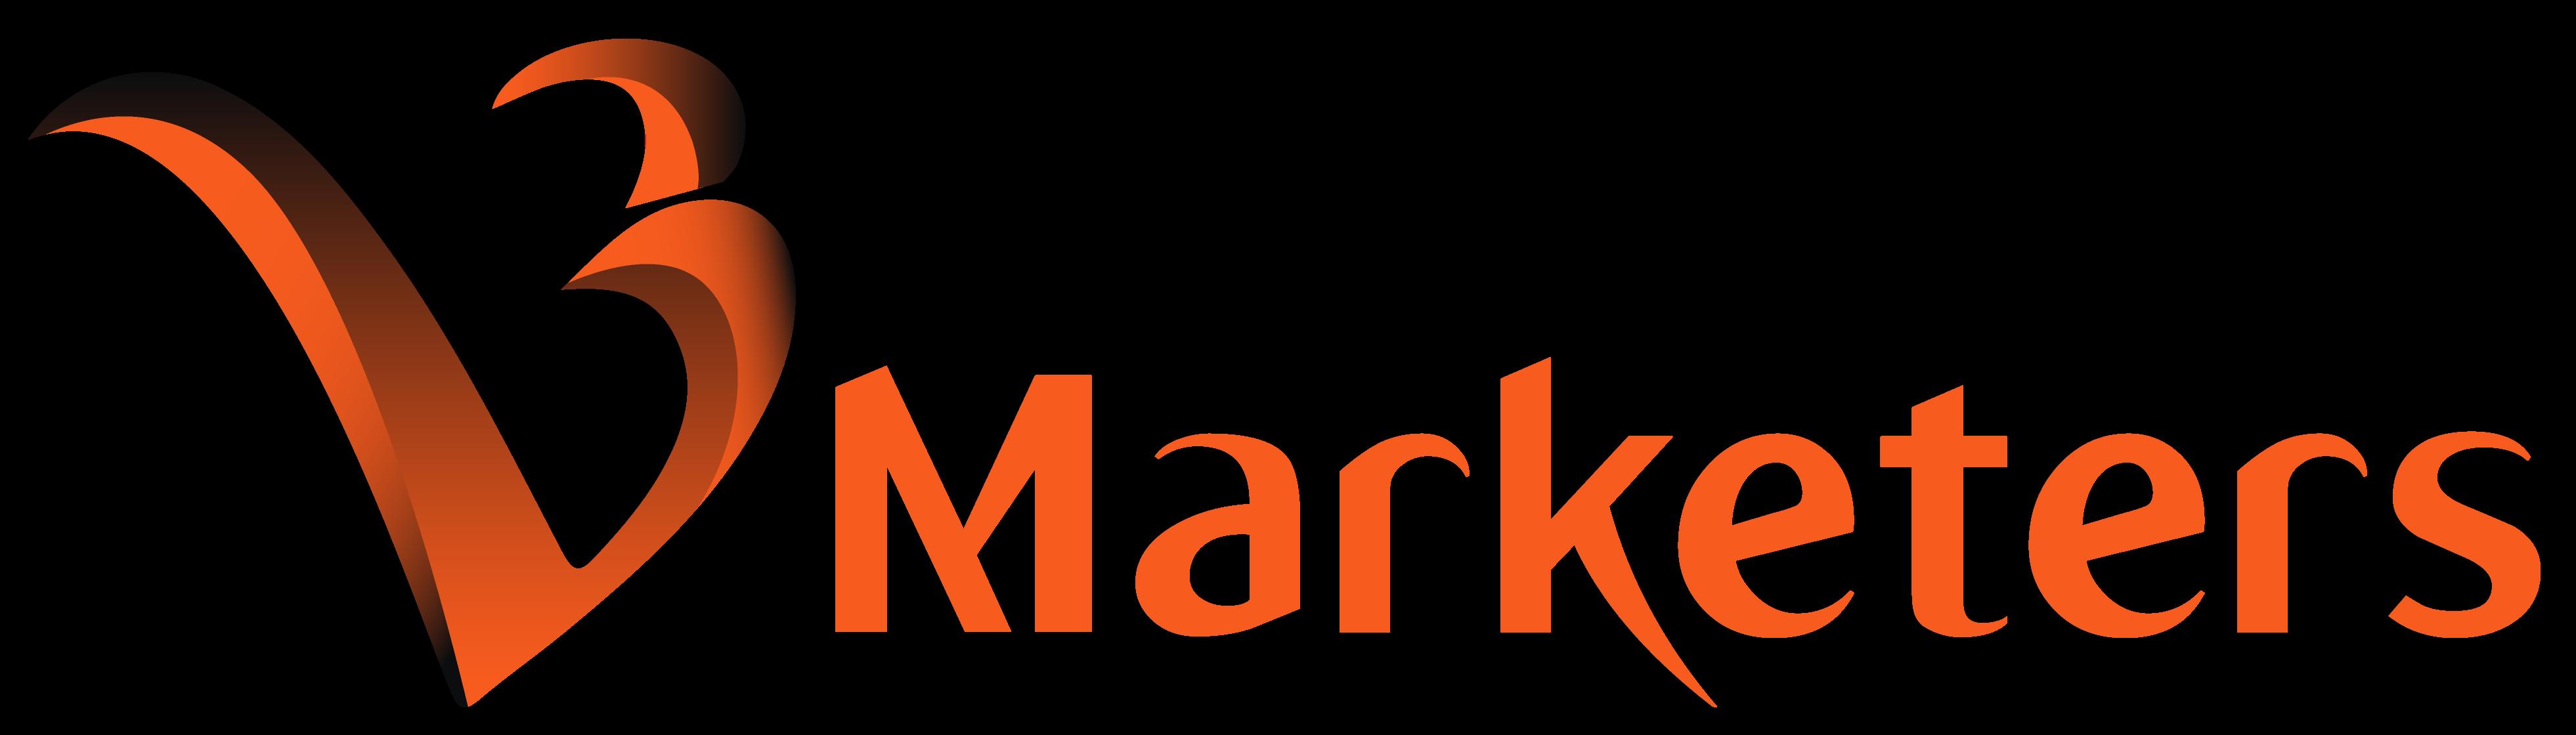 v3 logo final